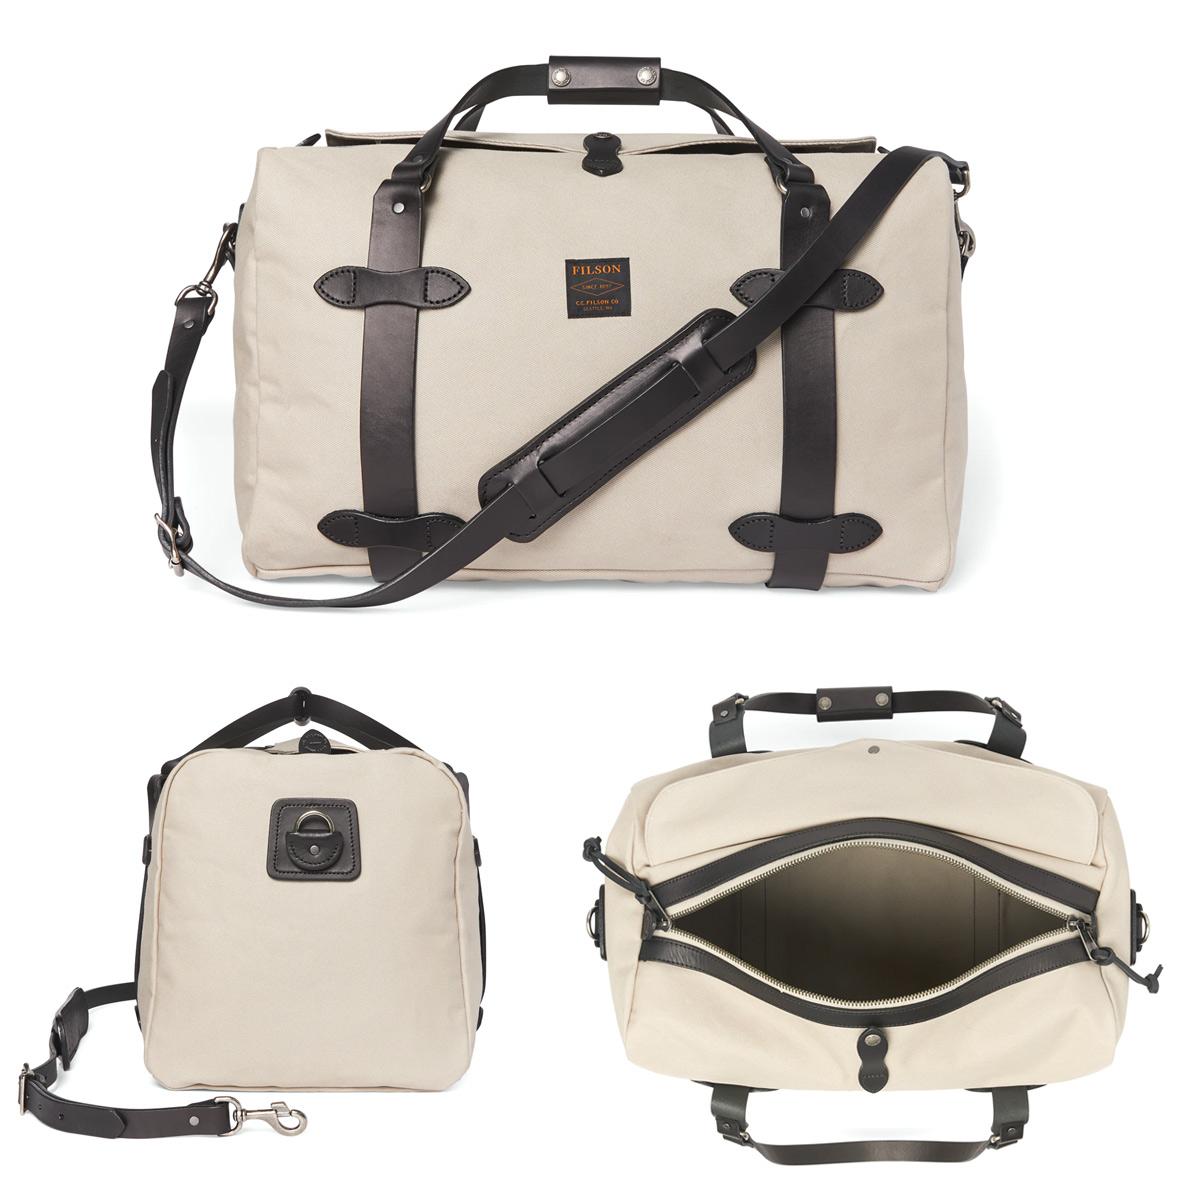 Filson Duffle Bag Medium Twine, stoere duffel die voldoet aan de maximale handbagage afmetingen